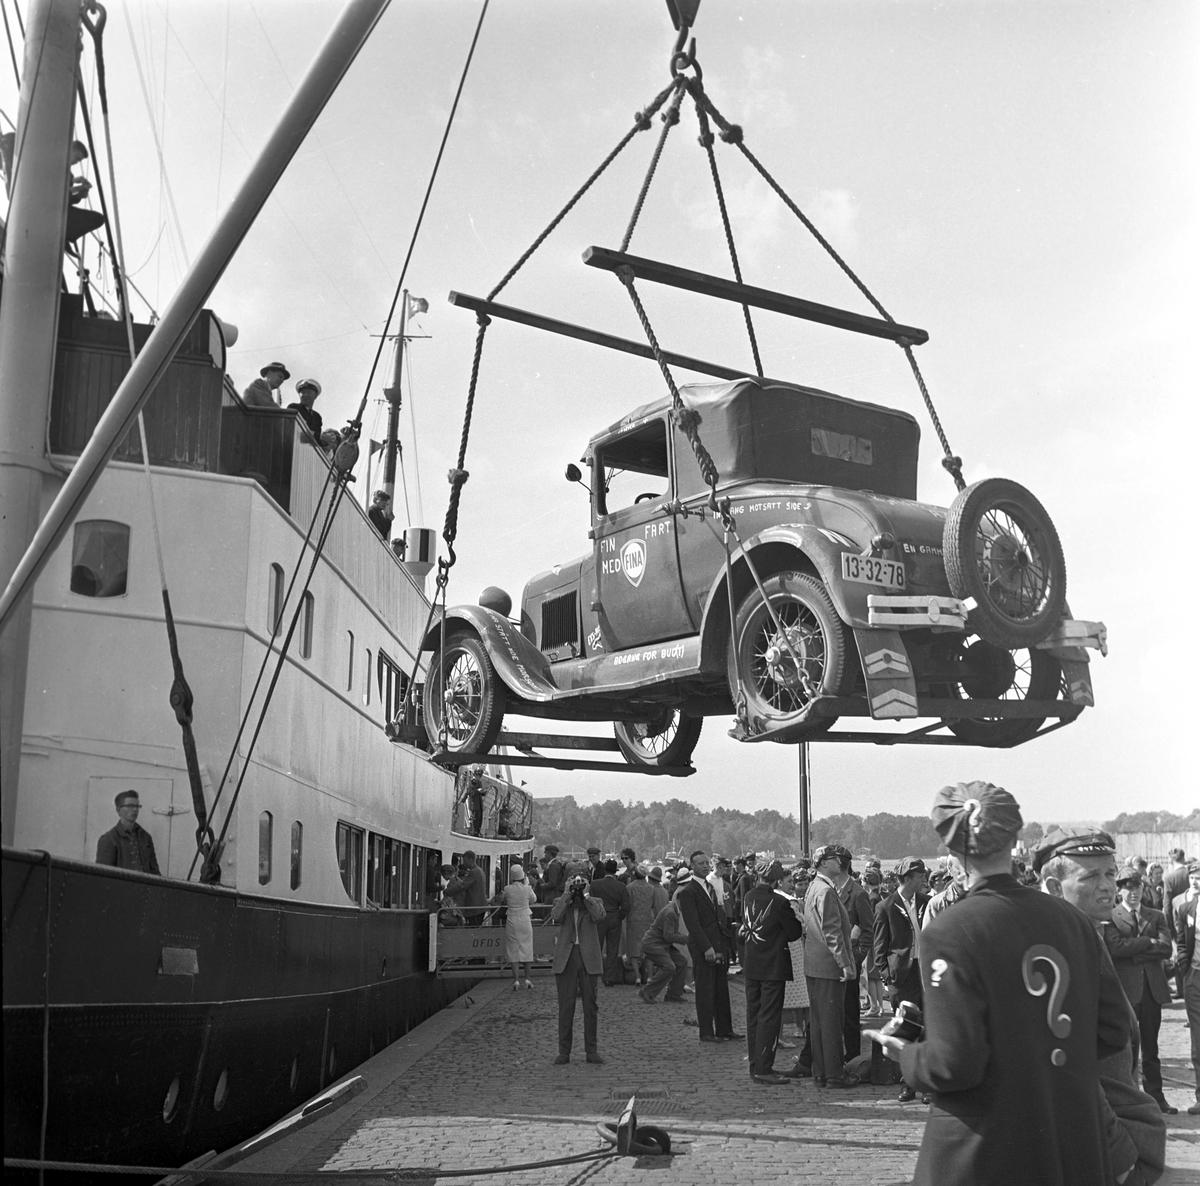 Serie. Russetur til København med MS Vistula og tilbake med ant. med sammen ferge. Fotografert juni 1961.